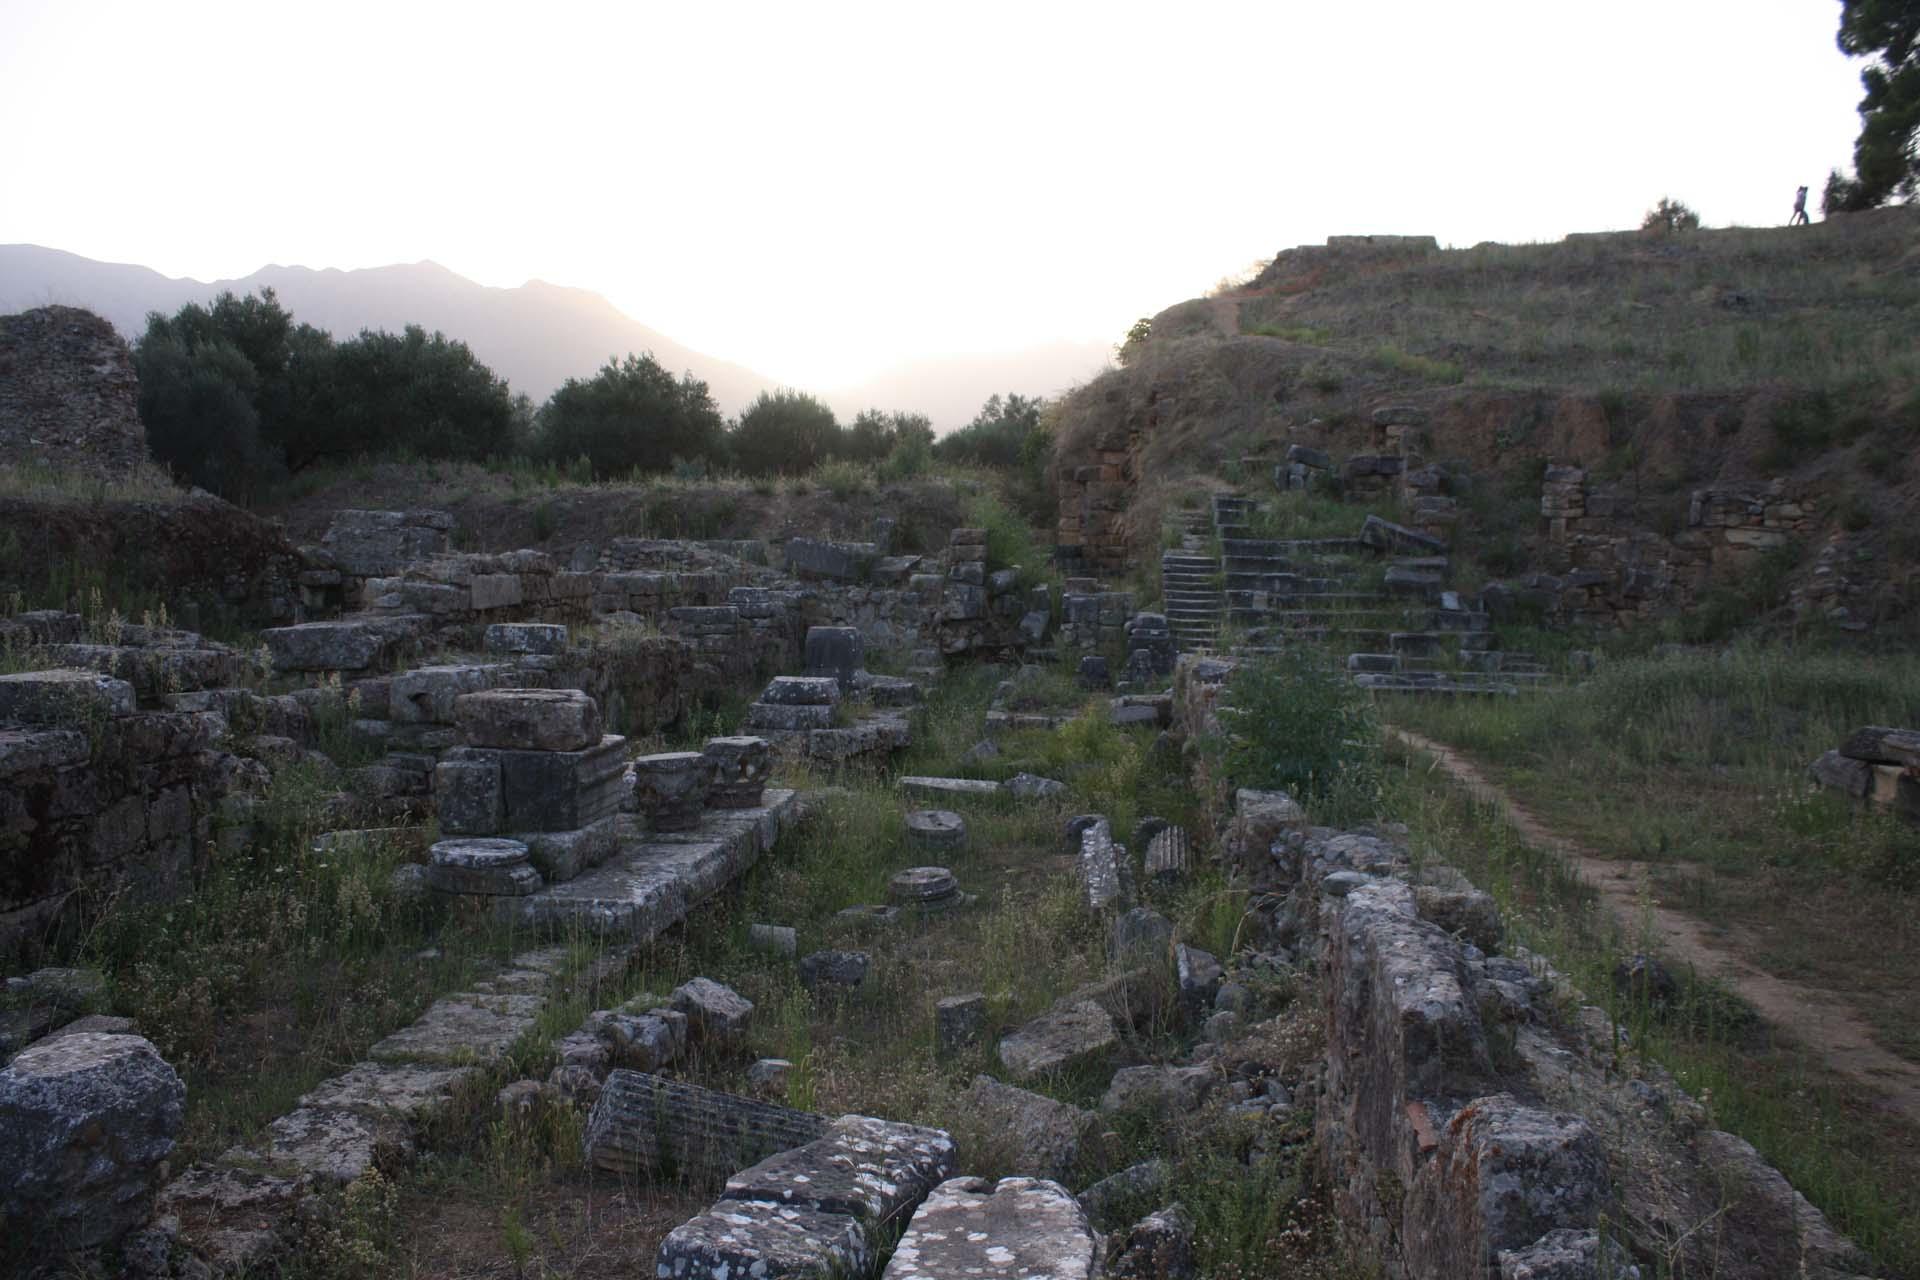 Ruines de la ville antique de Sparte